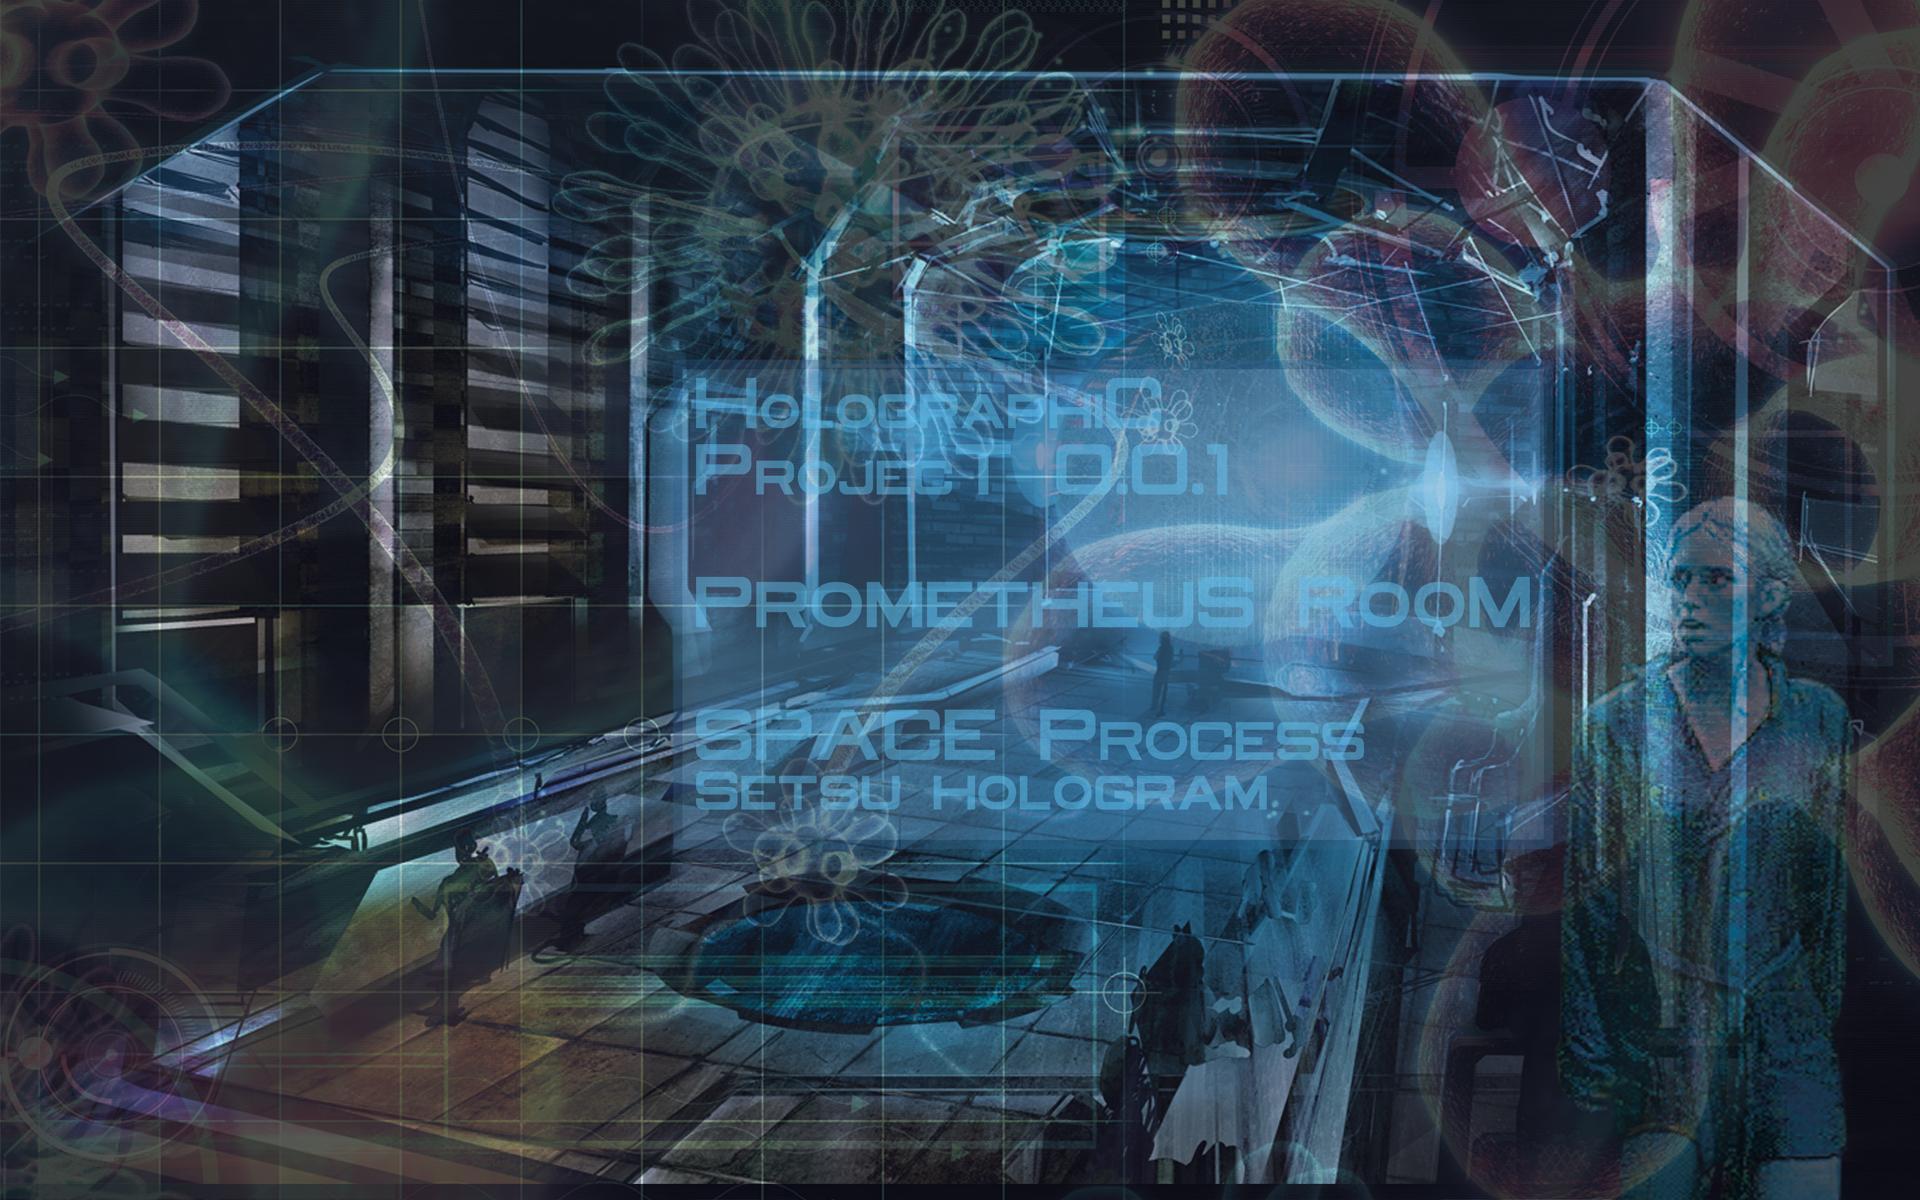 3d hologram wallpapers wallpaper cave - How to make 3d hologram wallpaper ...